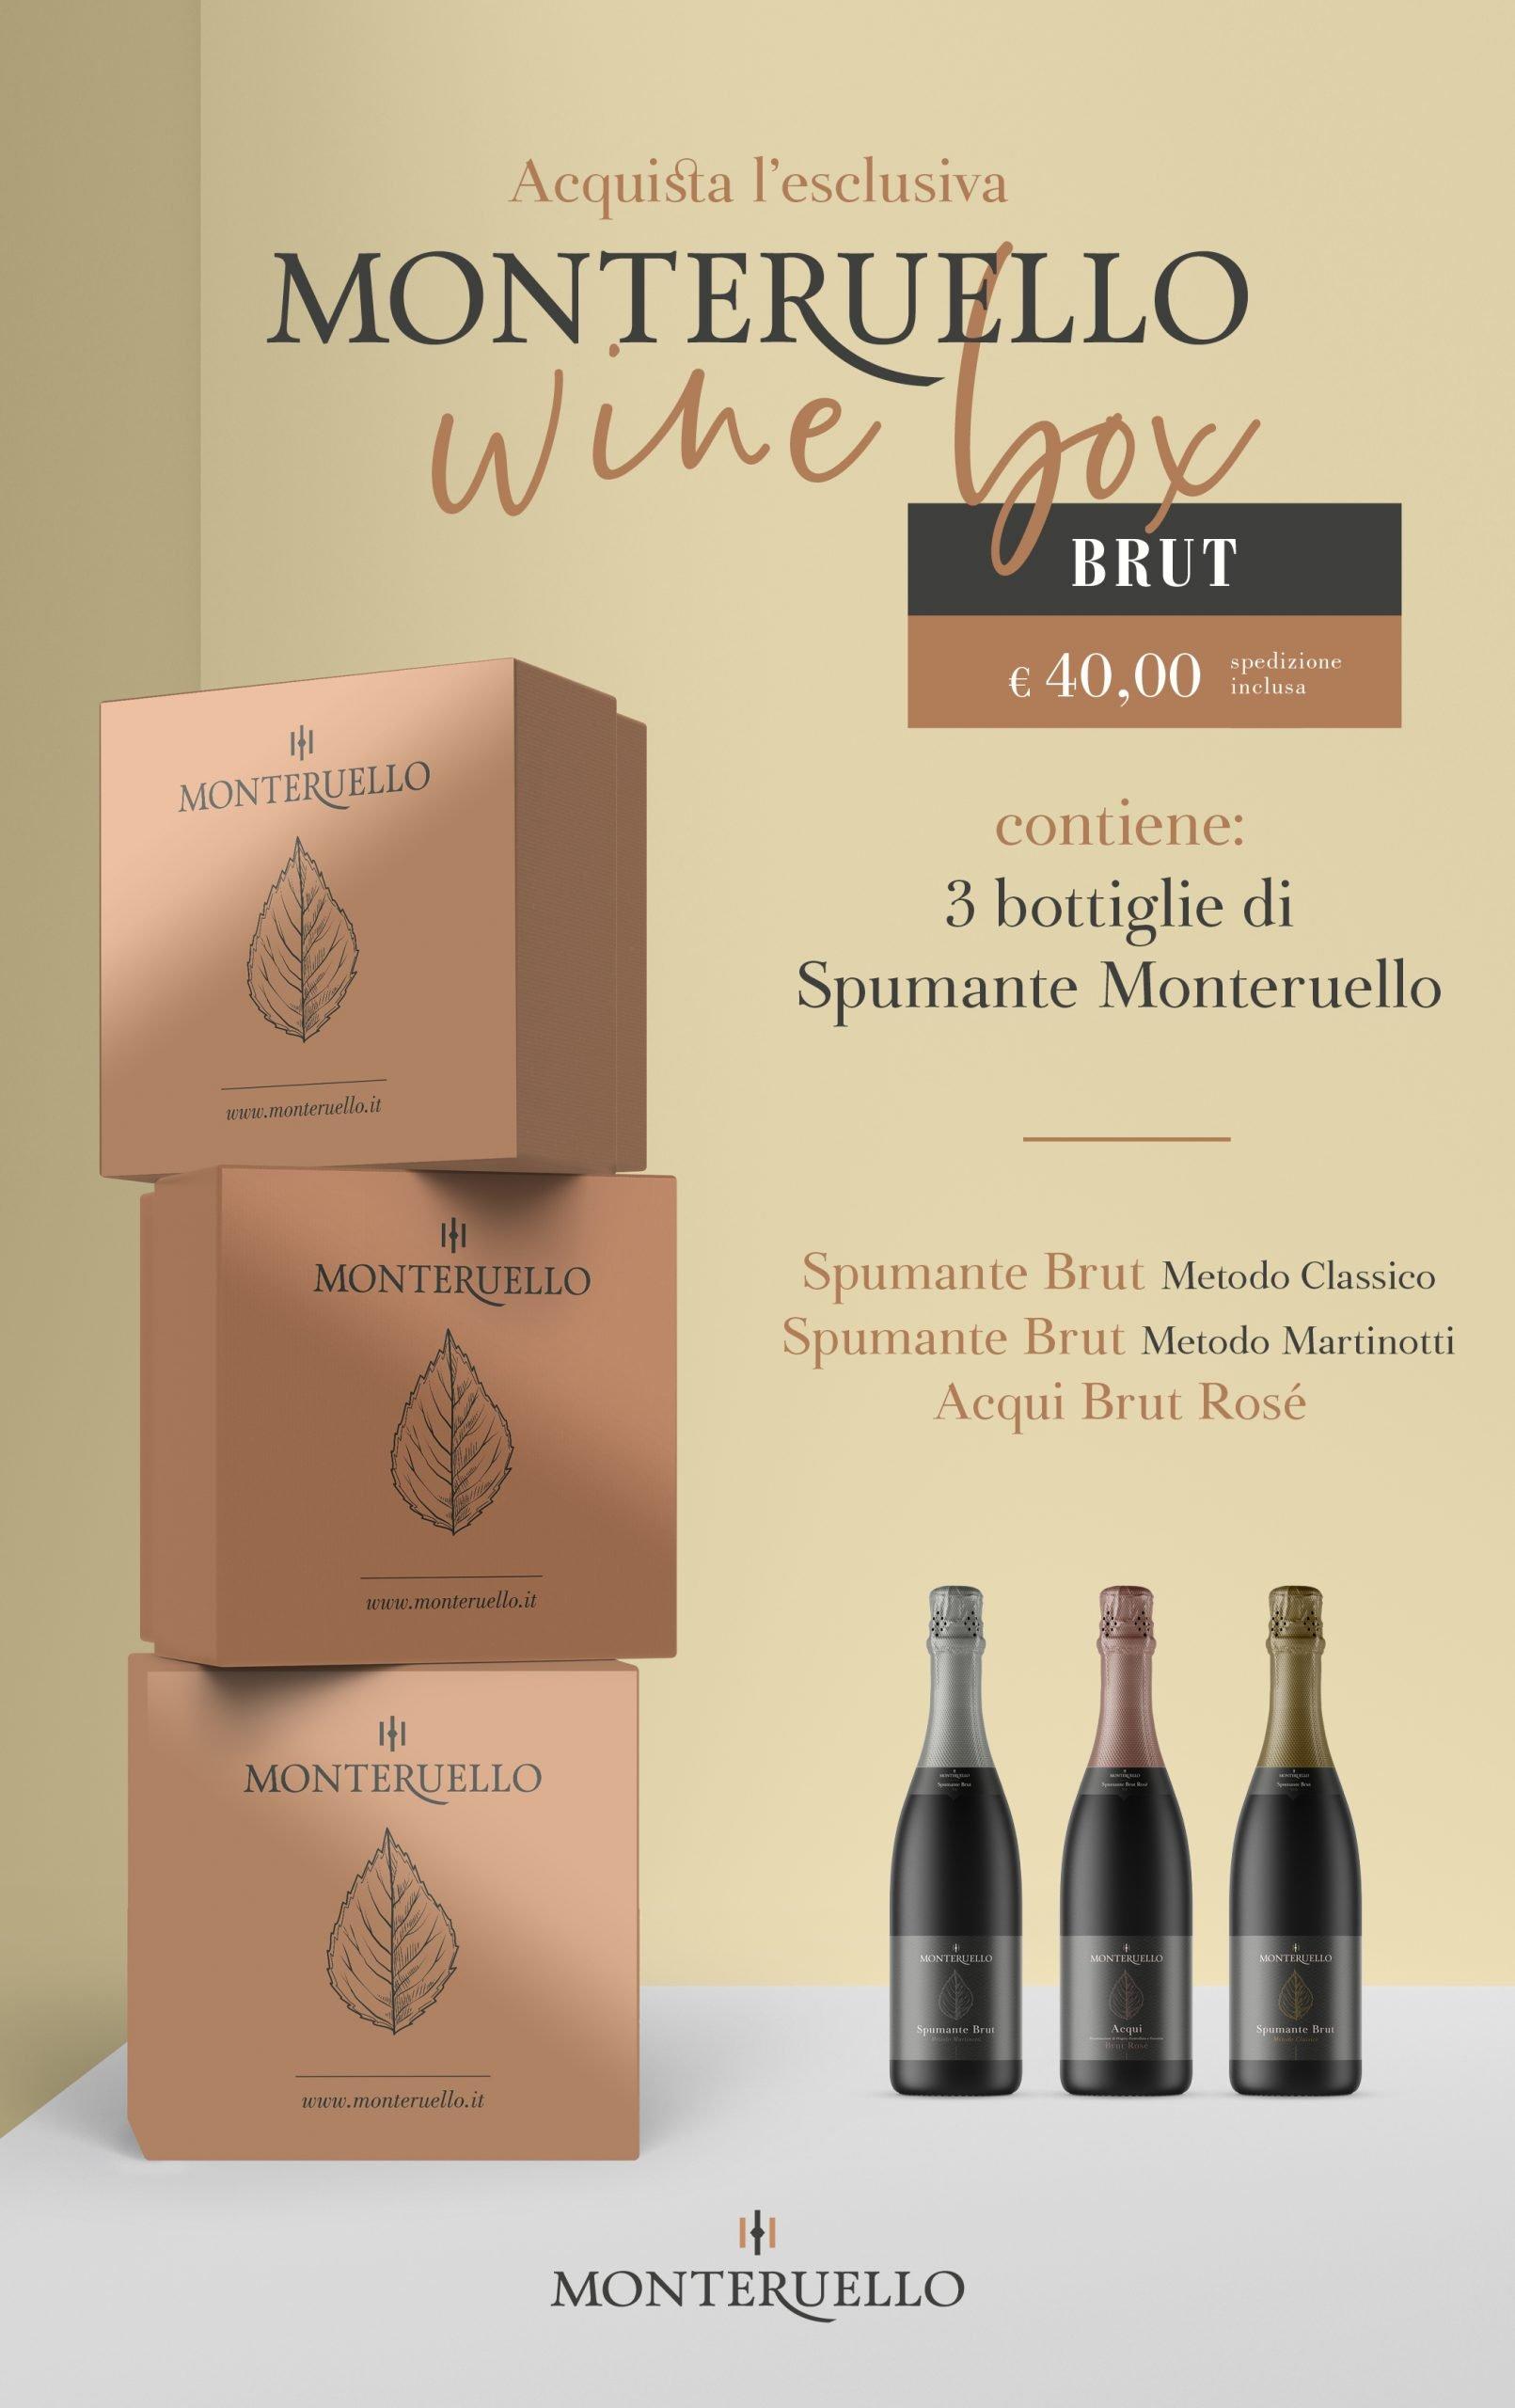 Monteruello | Wine Box | Brut | www.monteruello.it